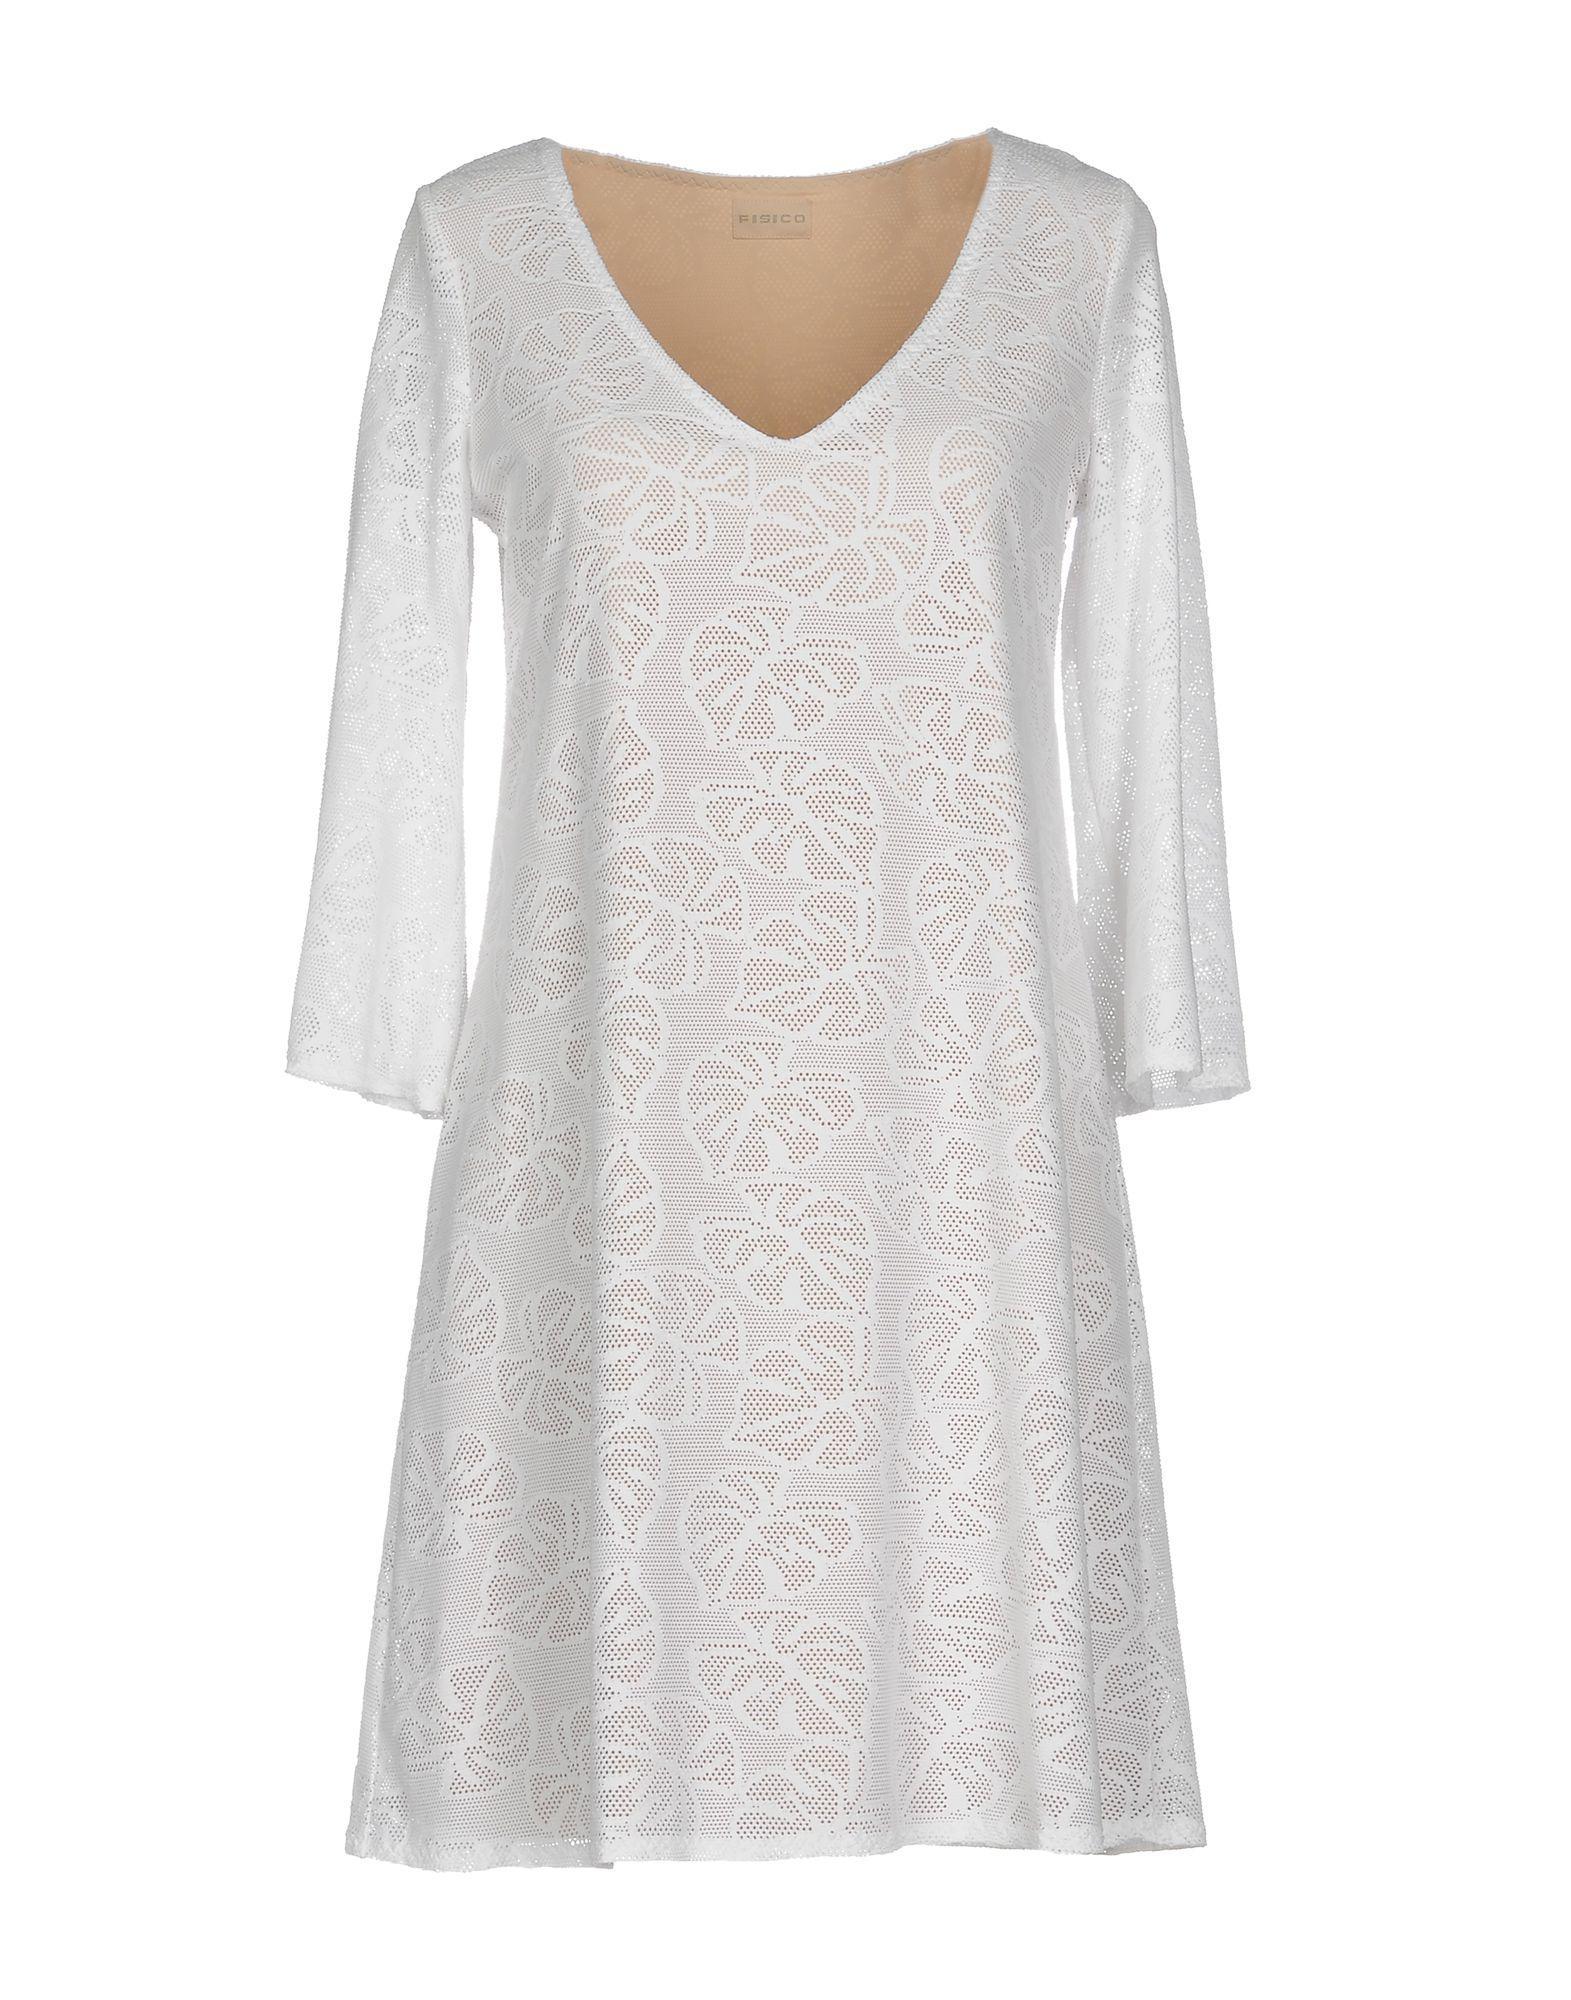 DRESSES - Short dresses Fisico YIPbbCg